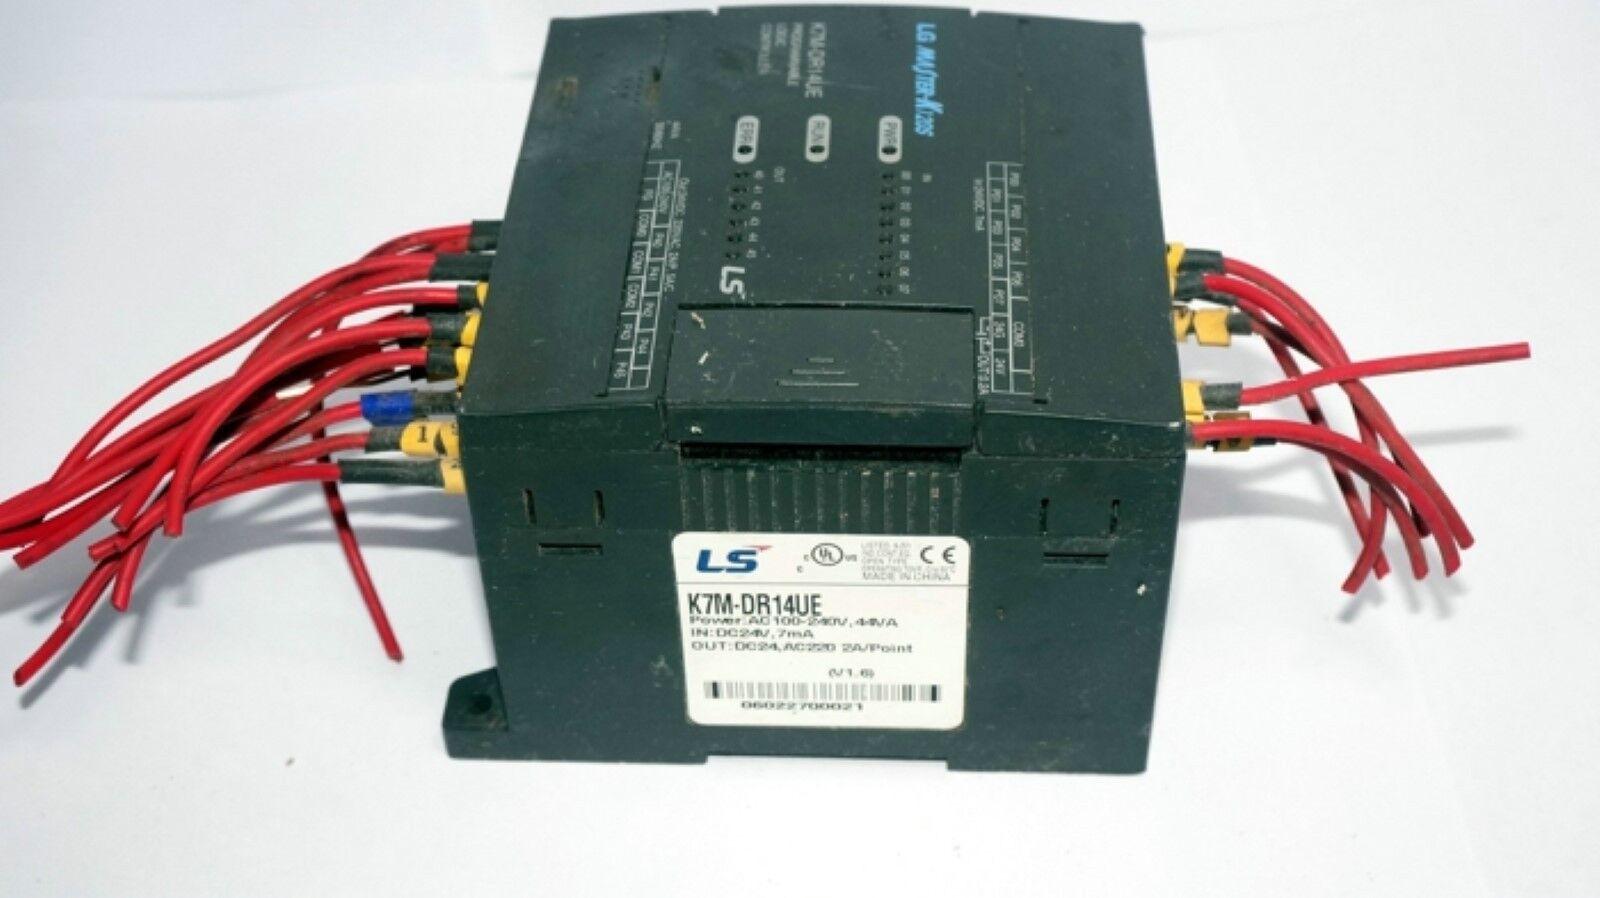 LG LS PLC programmable controller MASTER-K120S K7M-DR14UE